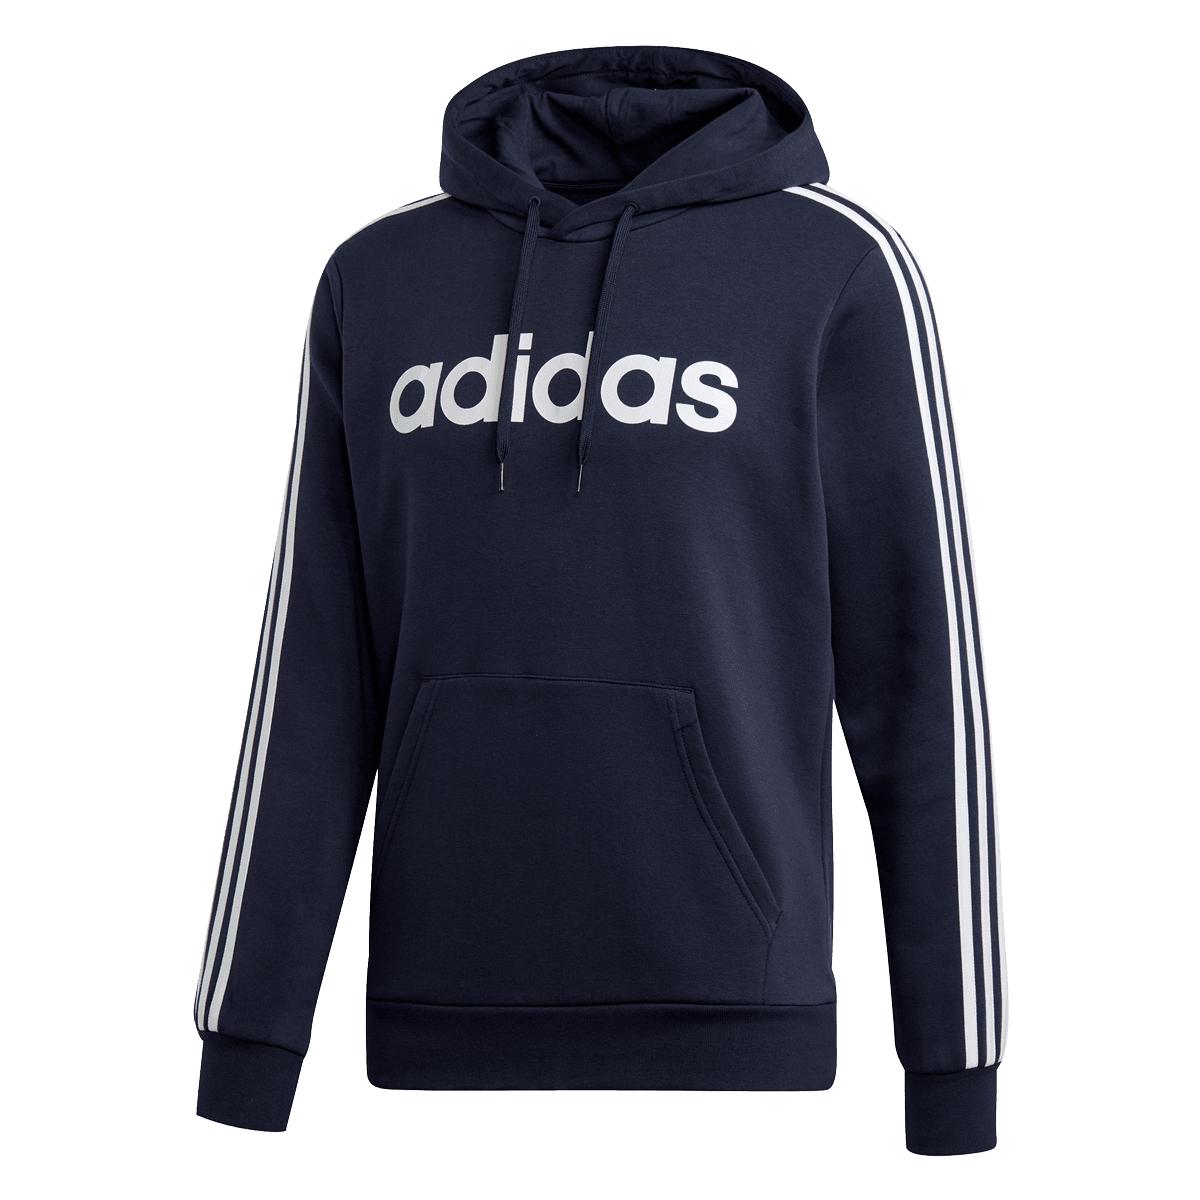 Adidas Essentials 3-Stripes Hoodie